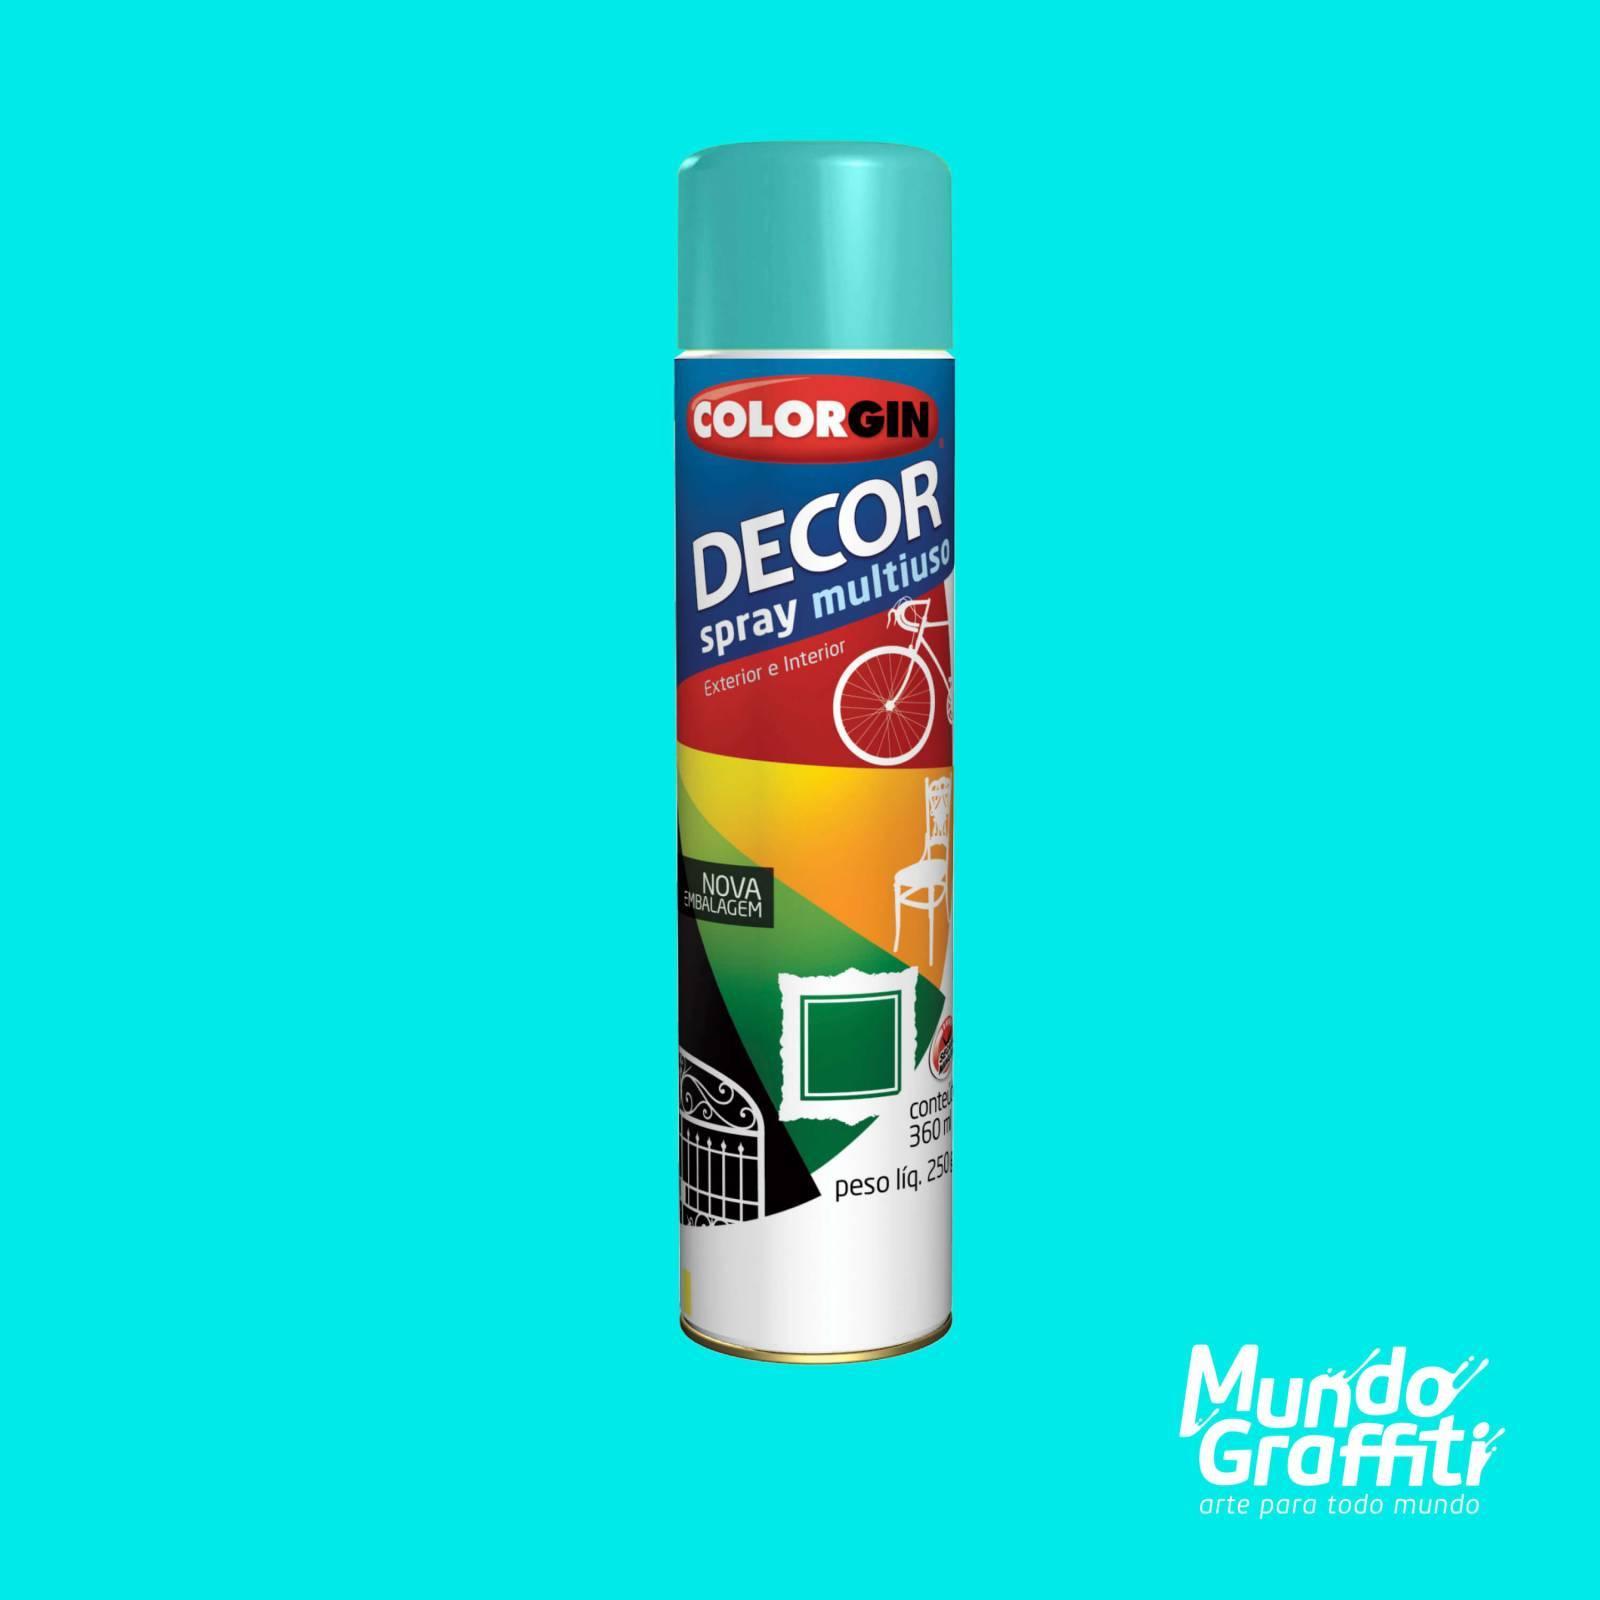 Tinta Spray Colorgin Decor 8631 Azul Céu Brilhante 360ml - Mundo Graffiti